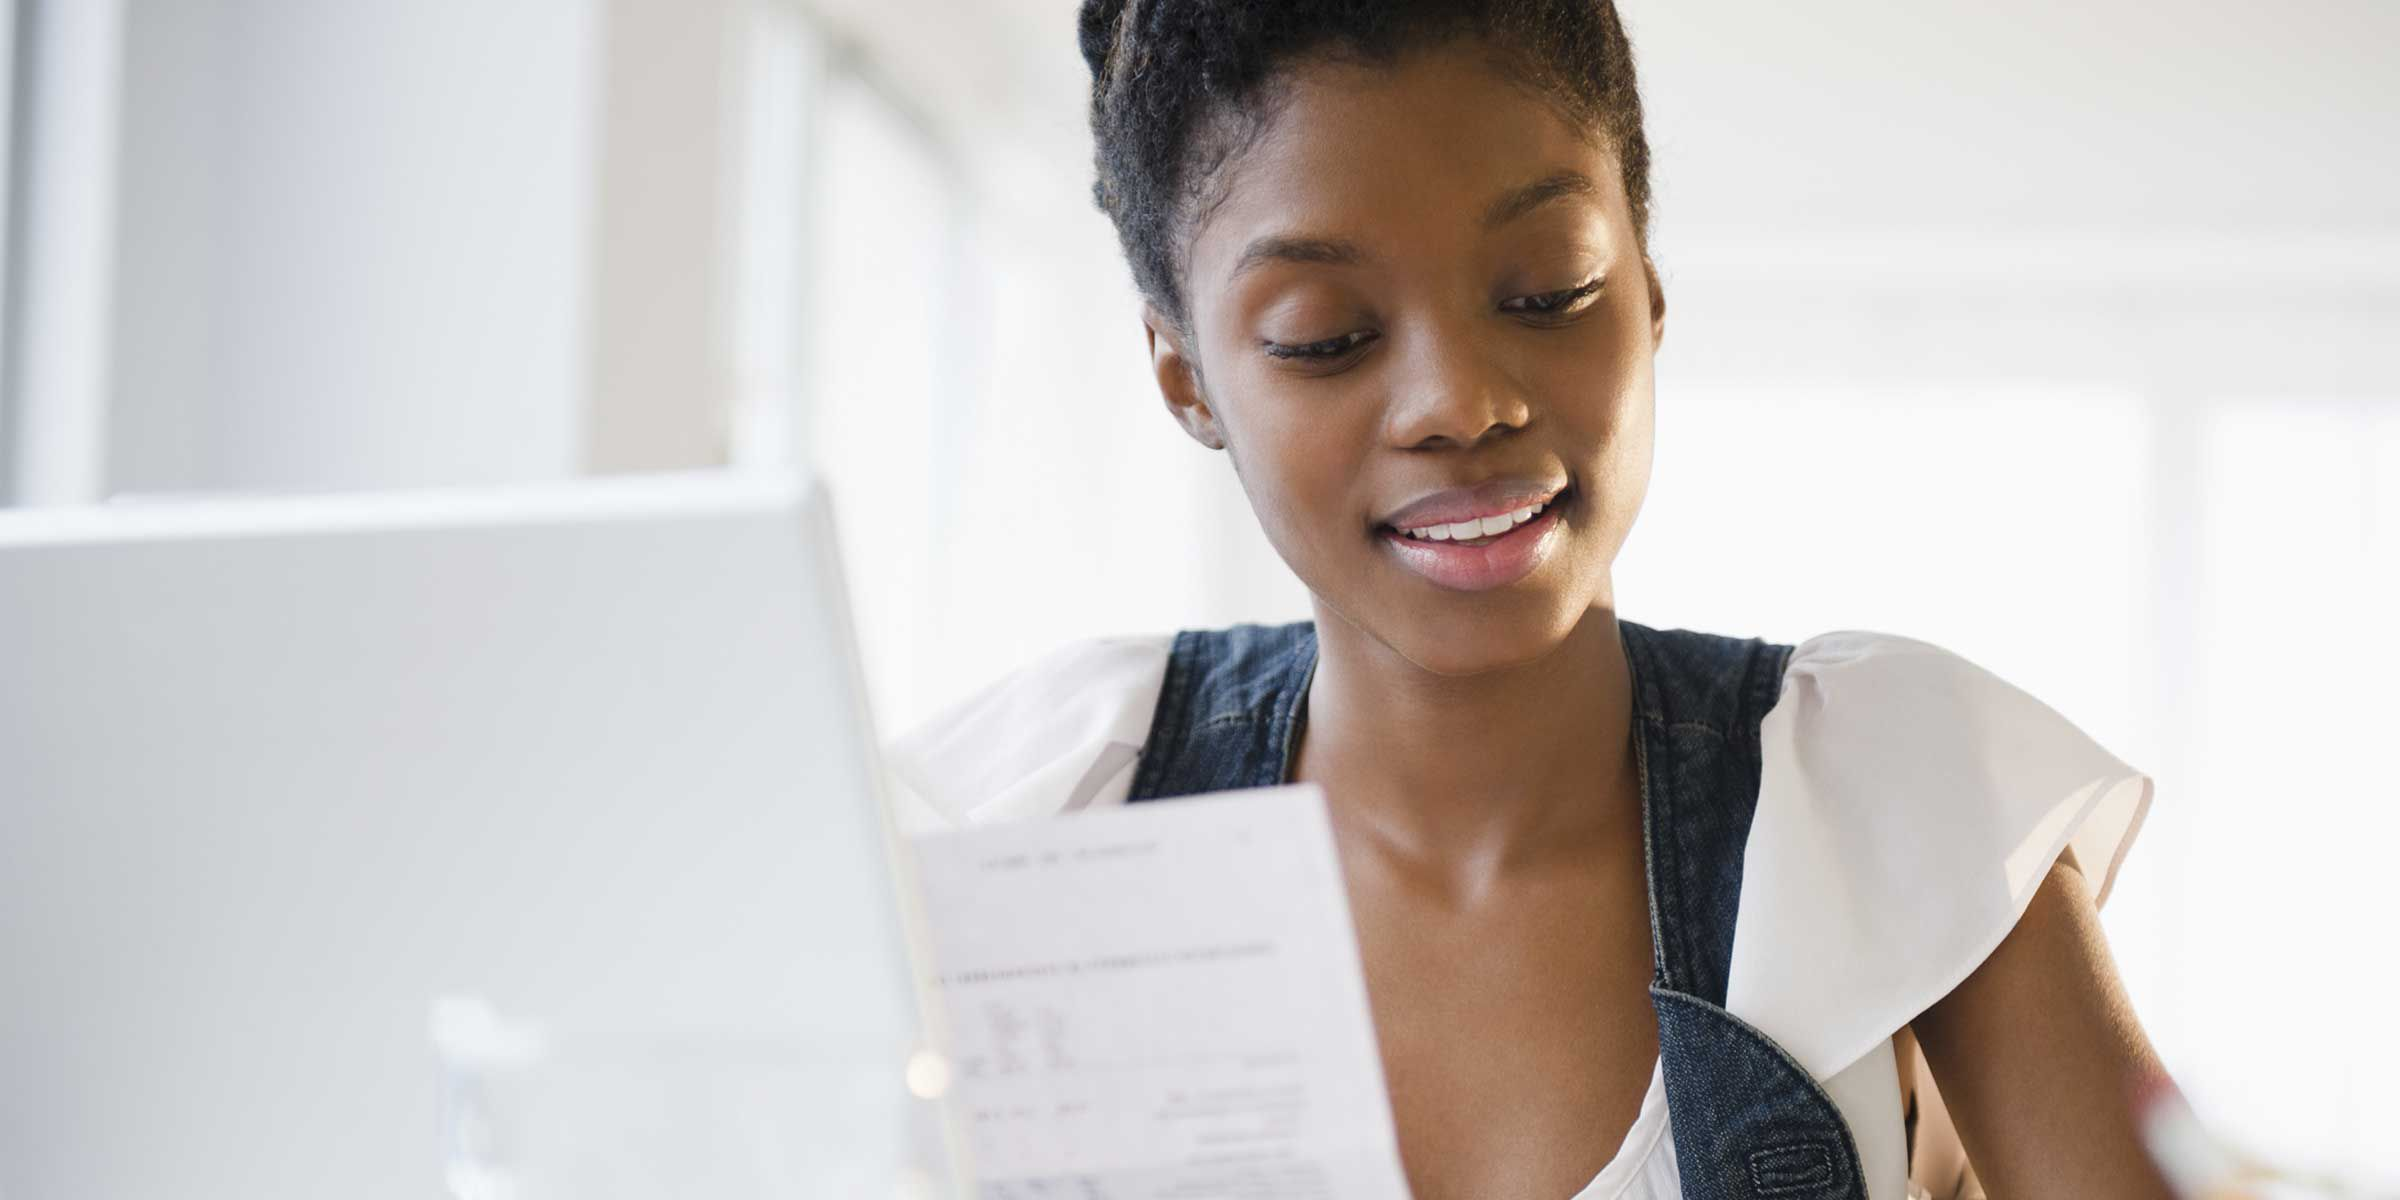 IVR Payments, BillMatrix | Fiserv